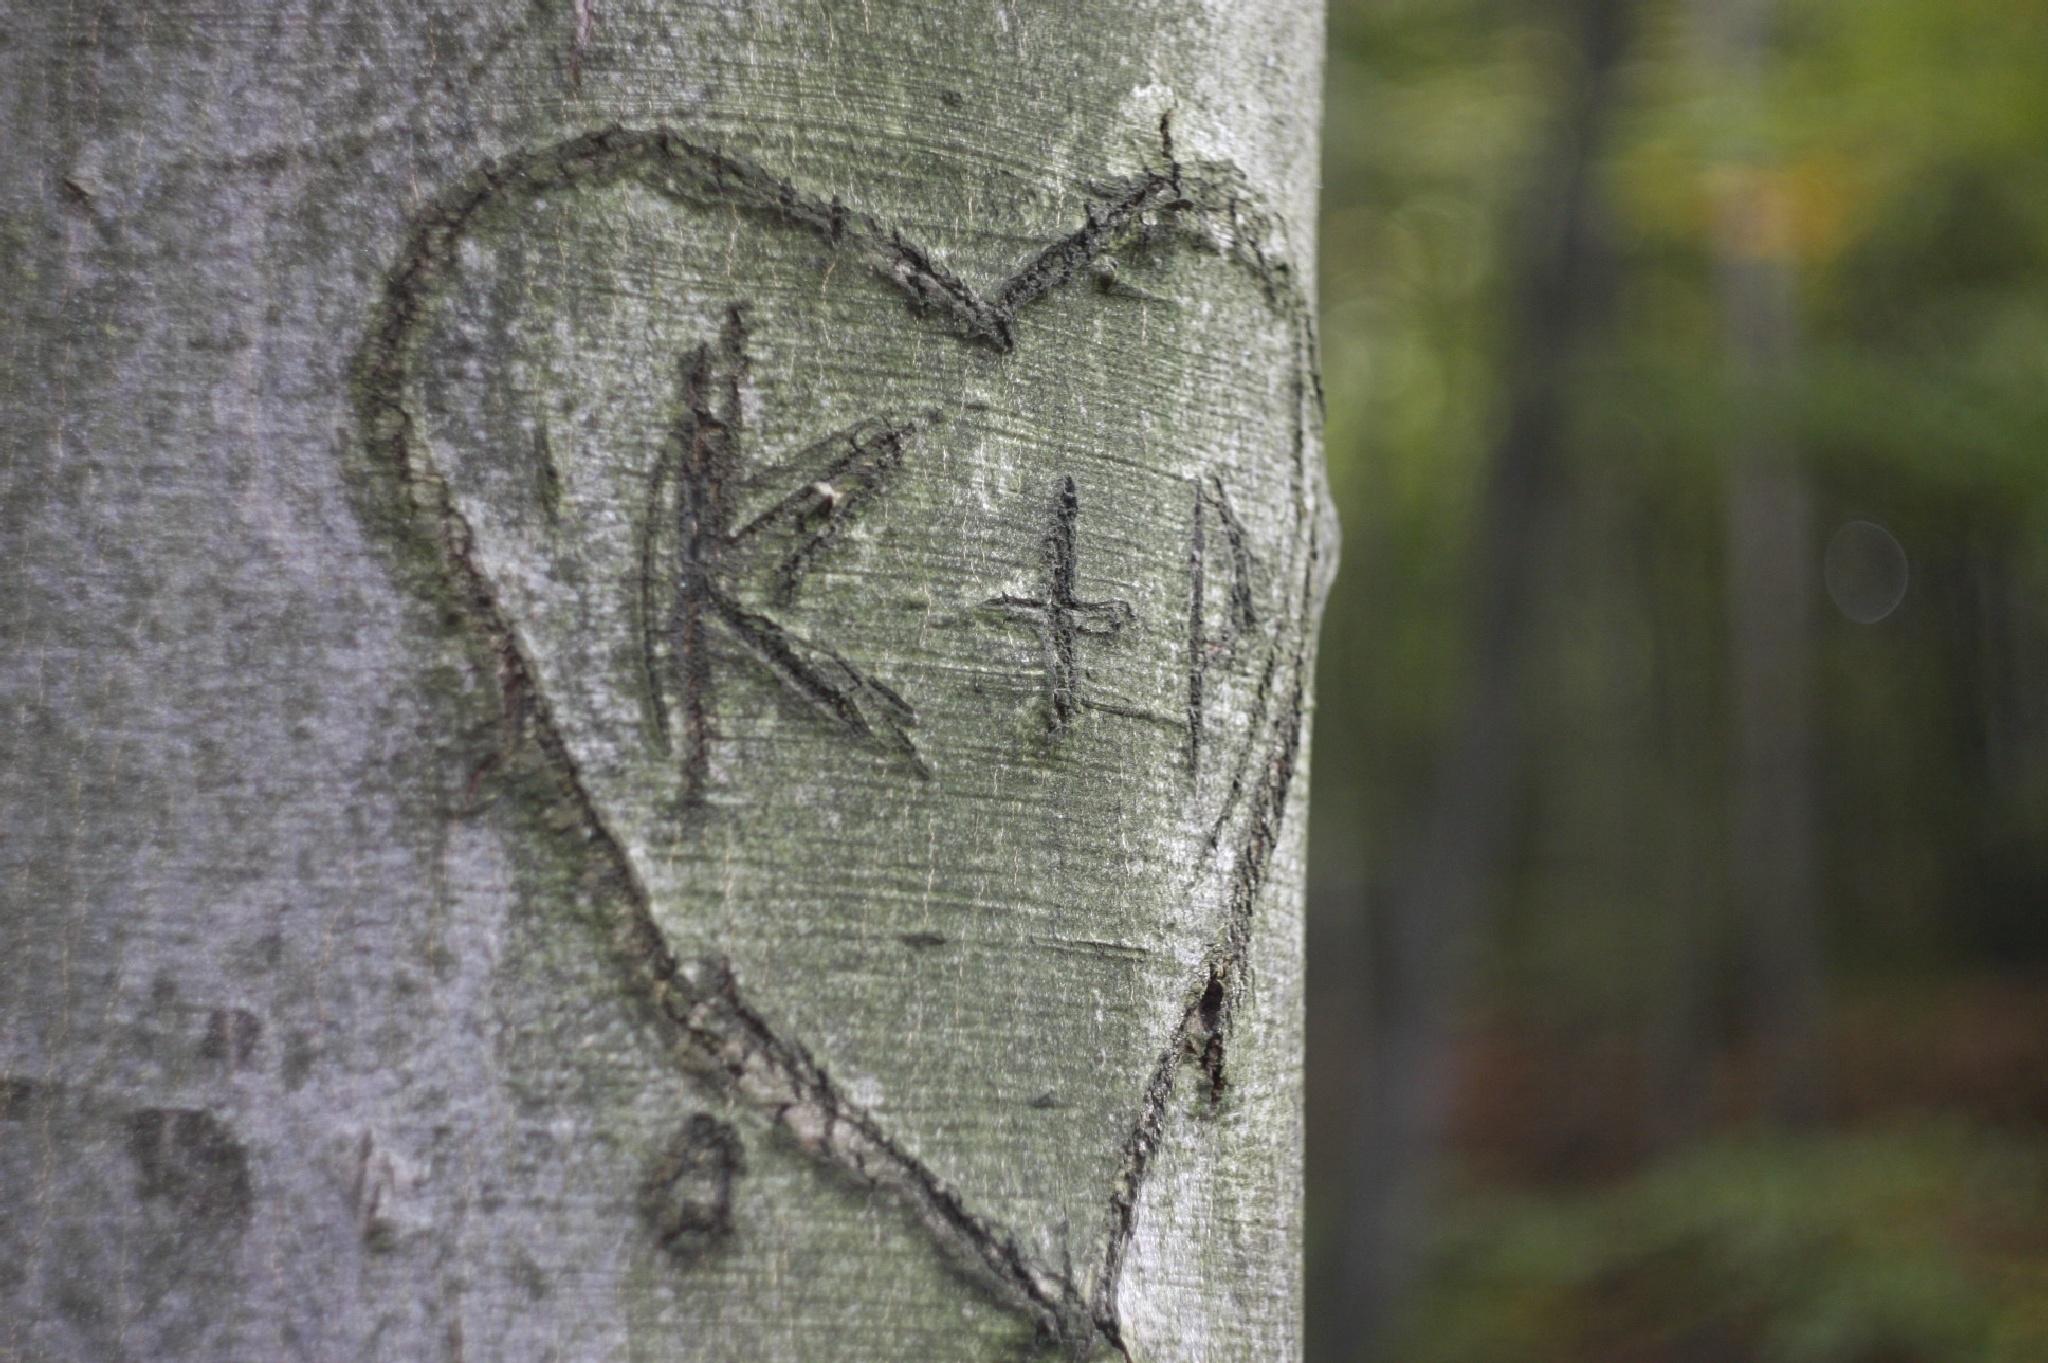 the lovers were here by Robert Jurczyk